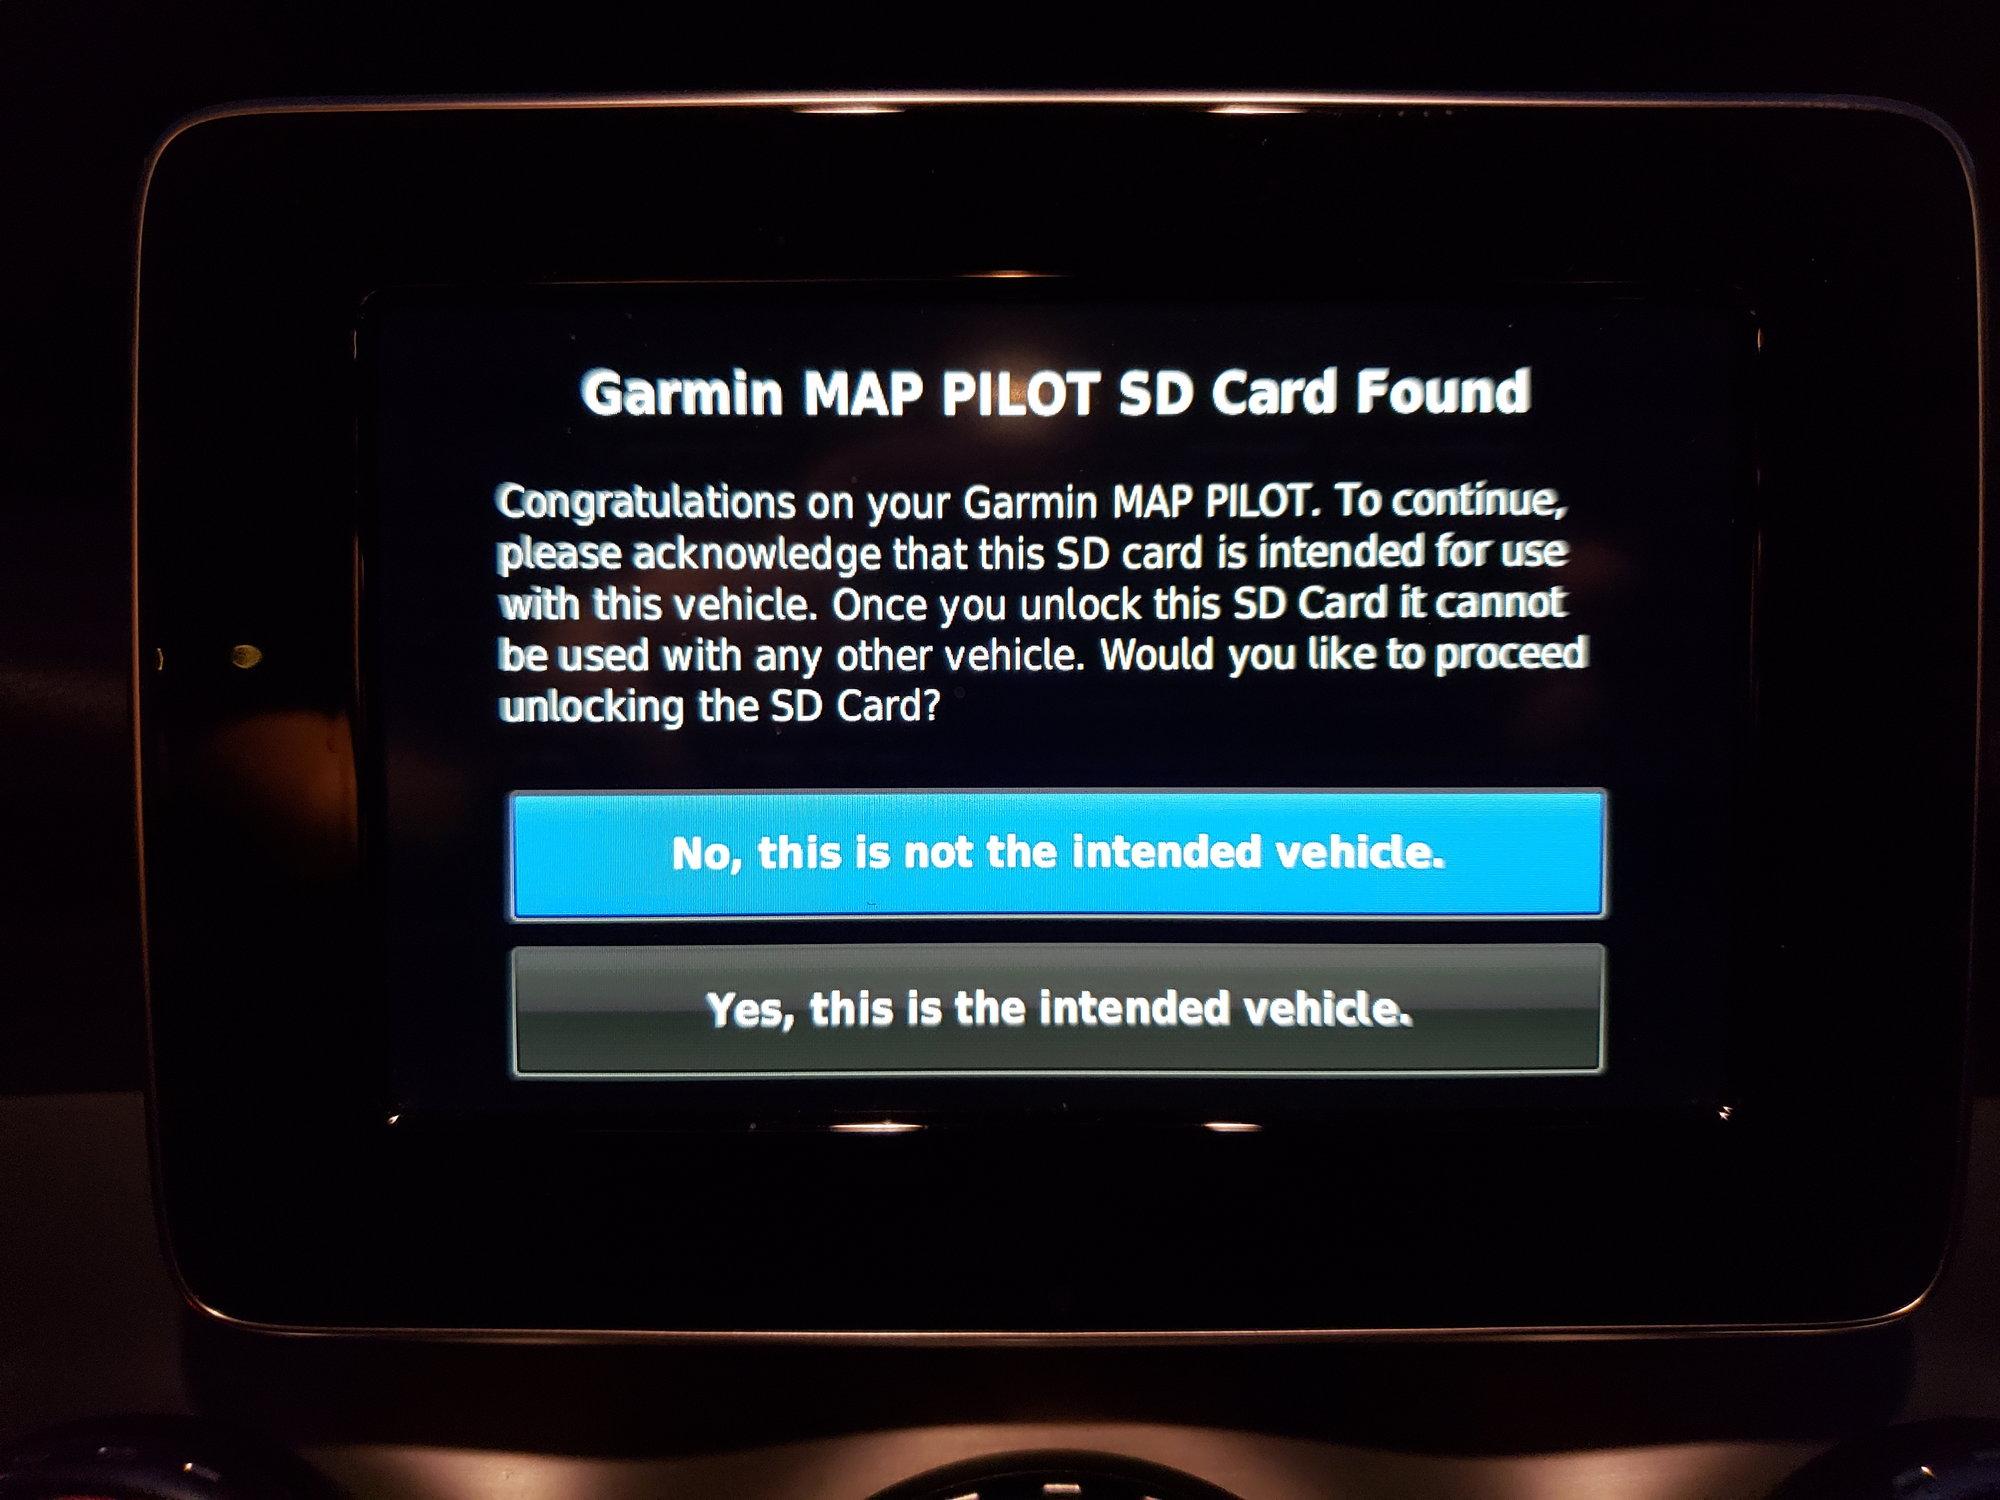 Garmin Map Pilot SD Card for a '19 Mercedes GLA    - MBWorld